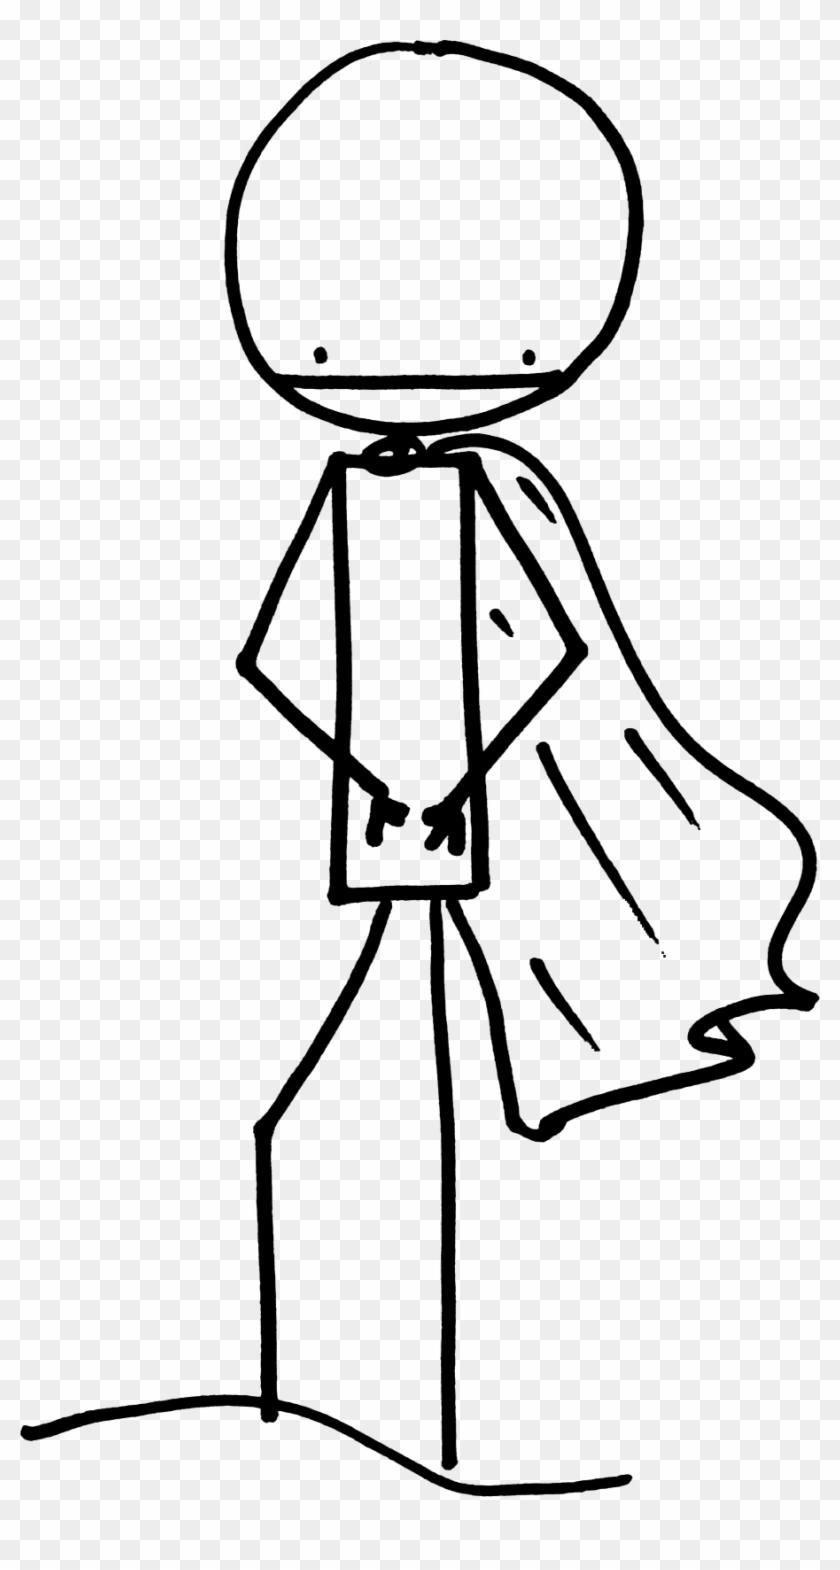 Stick Man With Cape - Stick Figure With Cape #132411